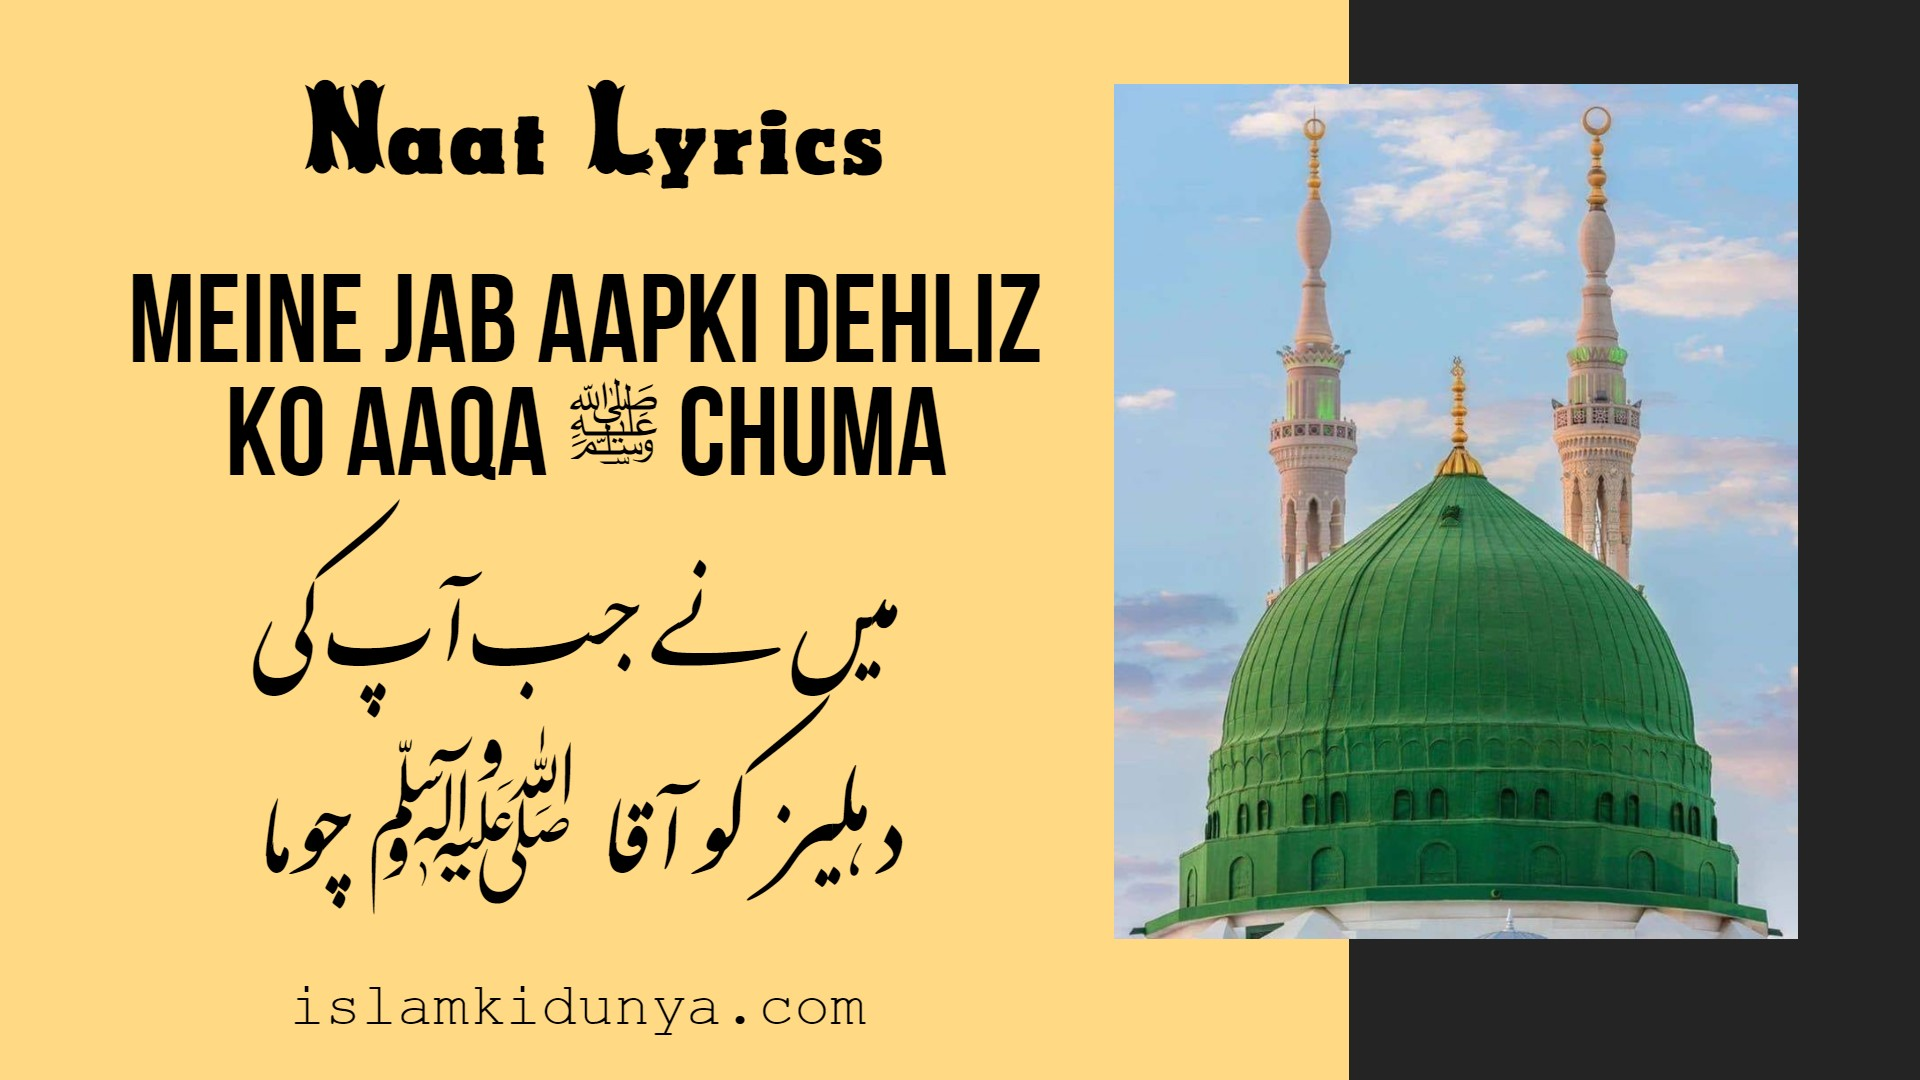 Meine Jab Aapki Dehliz ko Aaqa Chuma - Naat Lyrics in Urdu